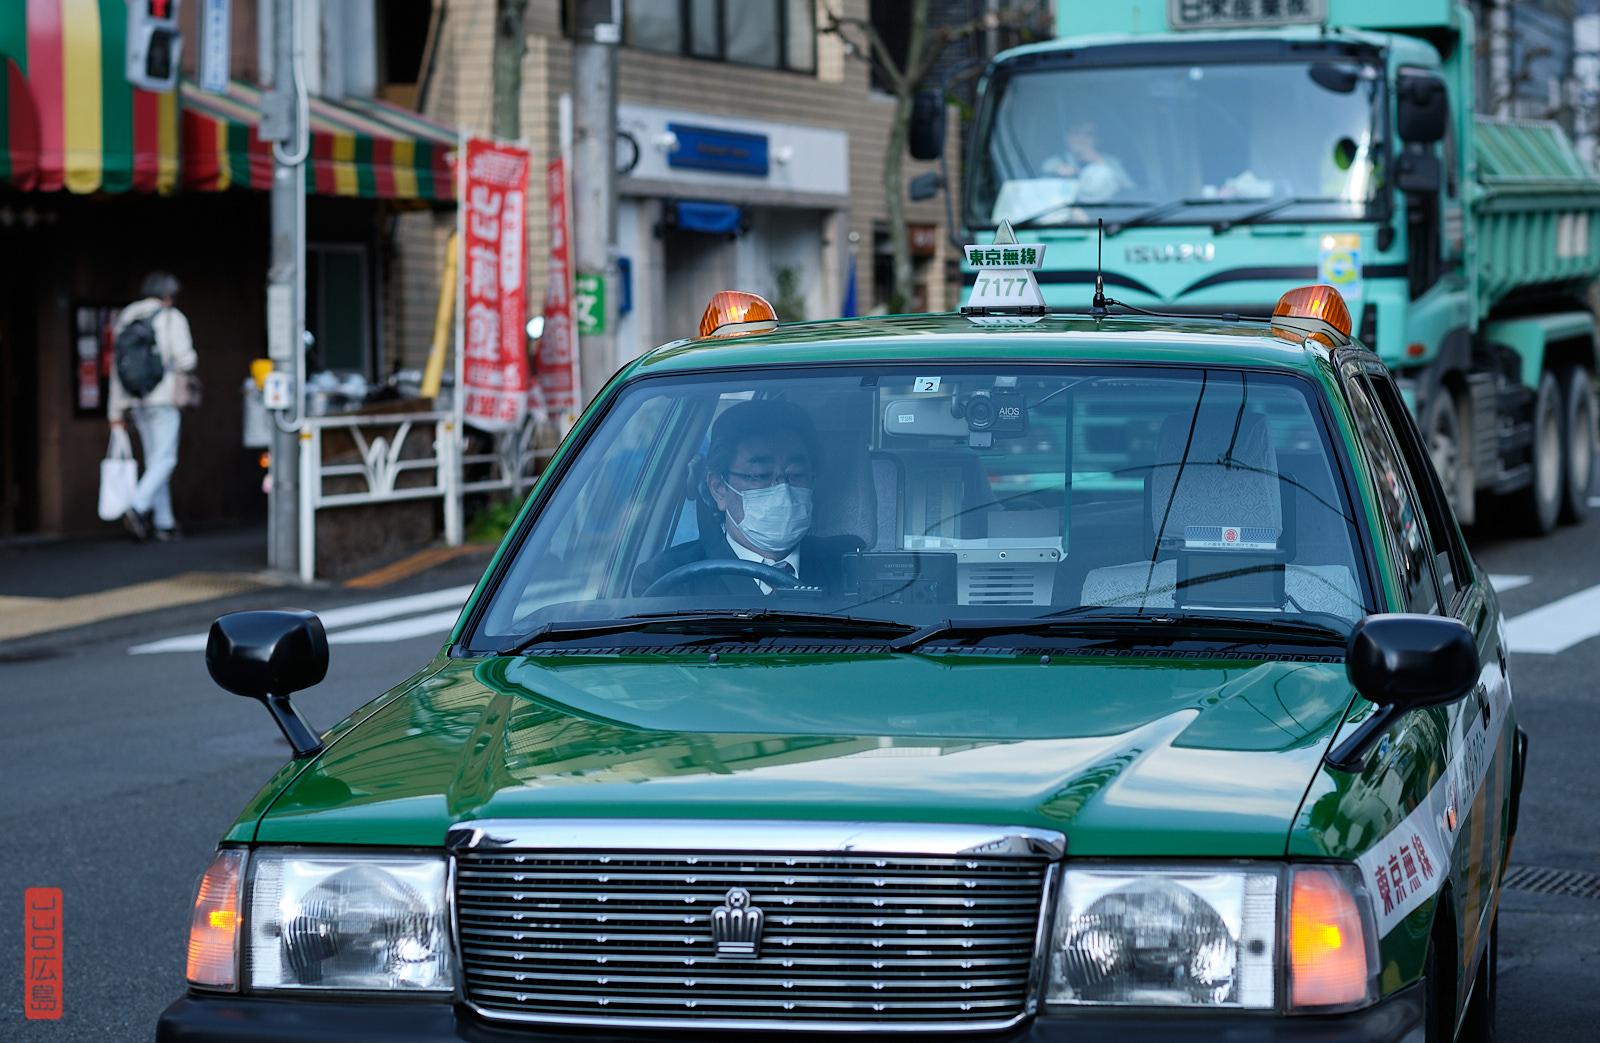 Conducteur de taxi portant un masque, Yoyogi, Tokyo, Japon